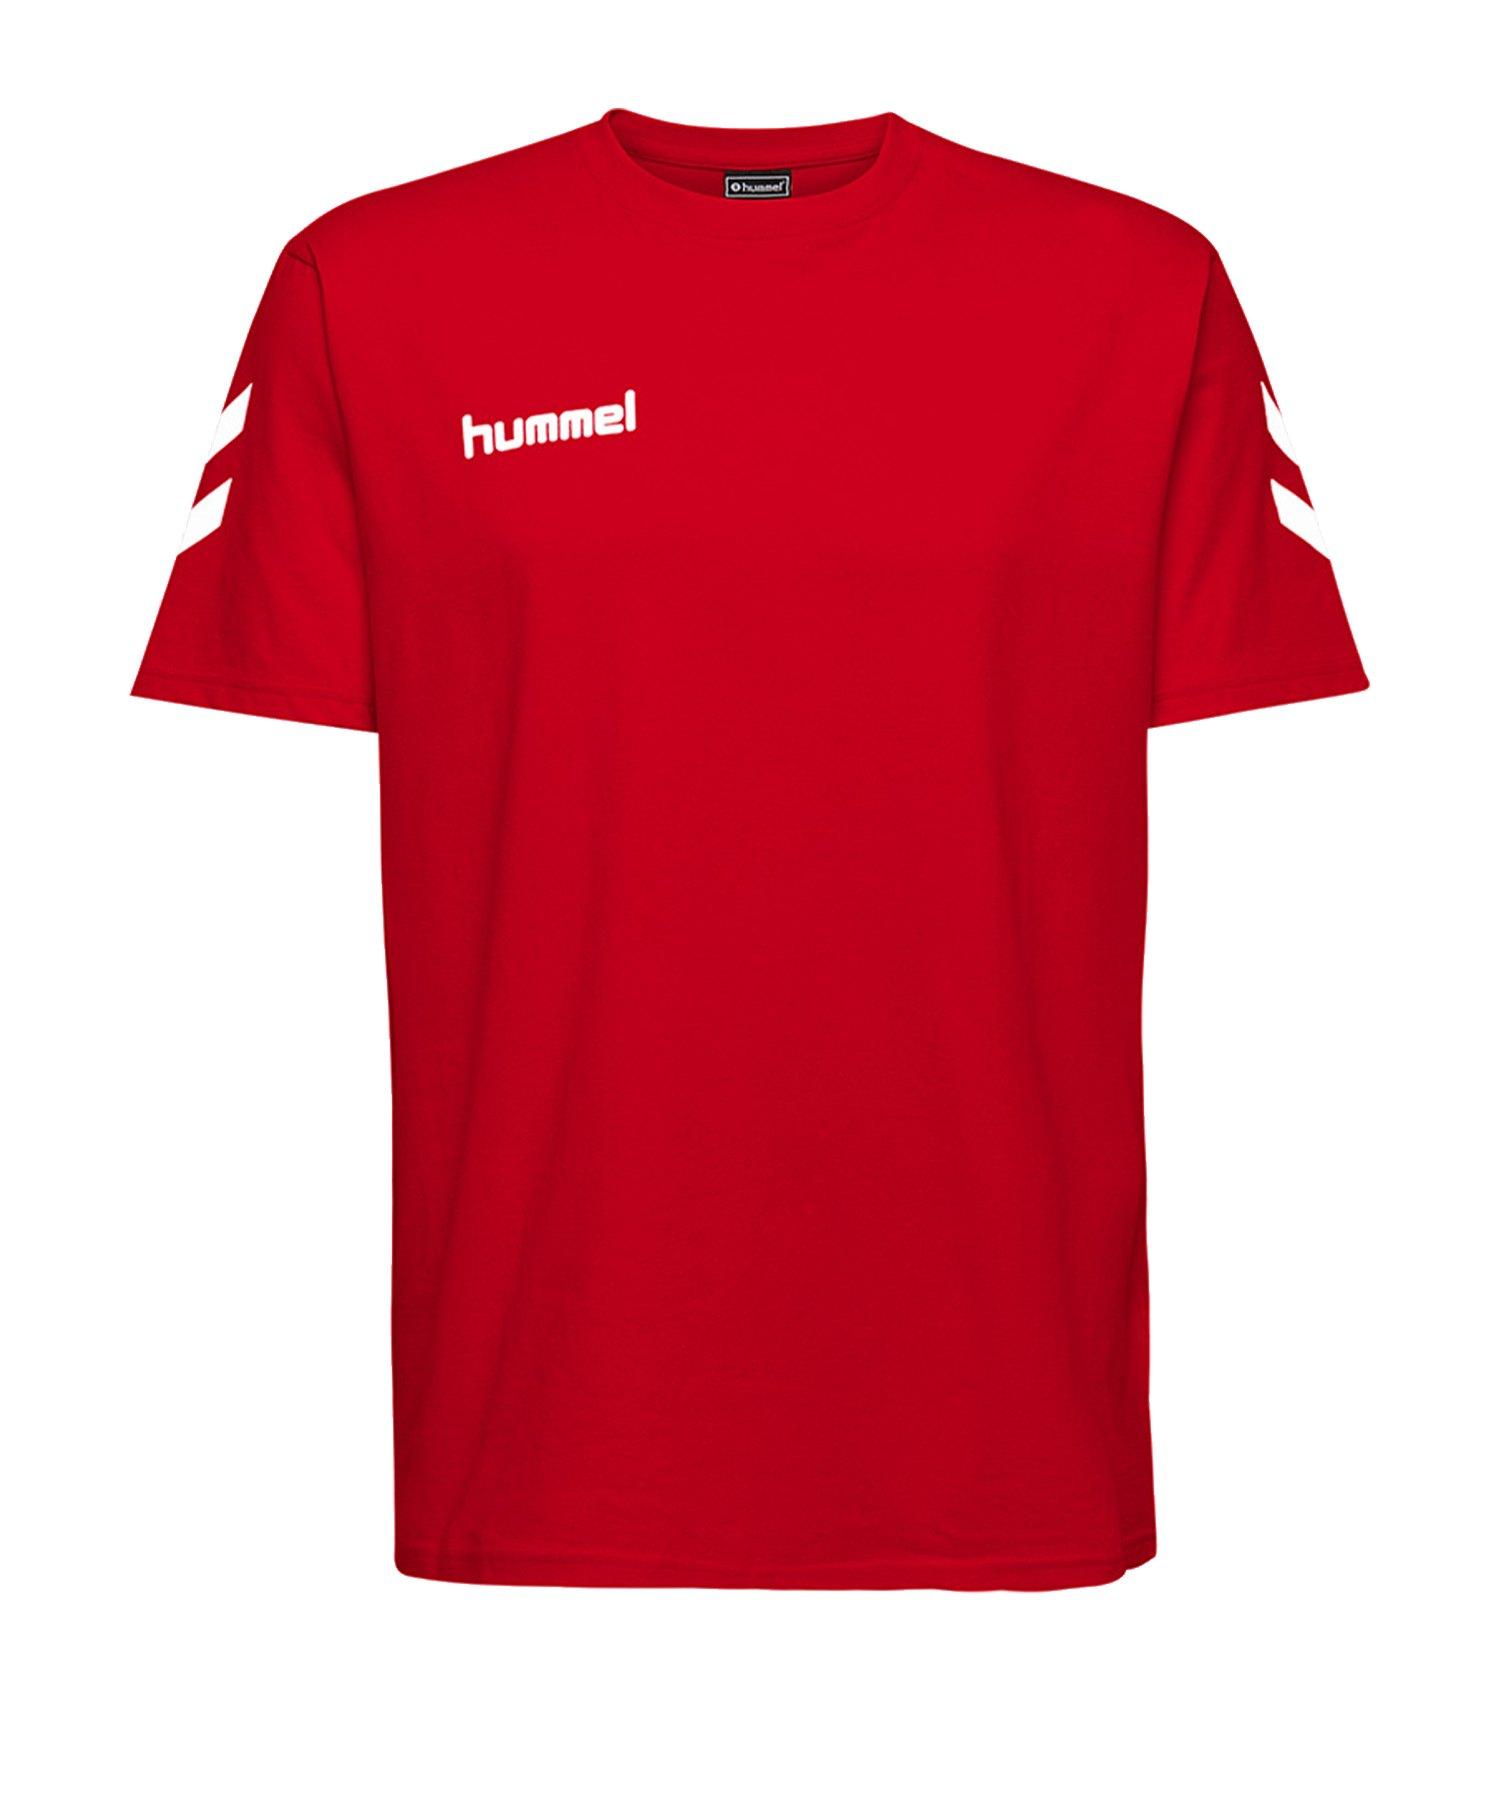 Hummel Cotton T-Shirt Kids Rot F3062 - Rot